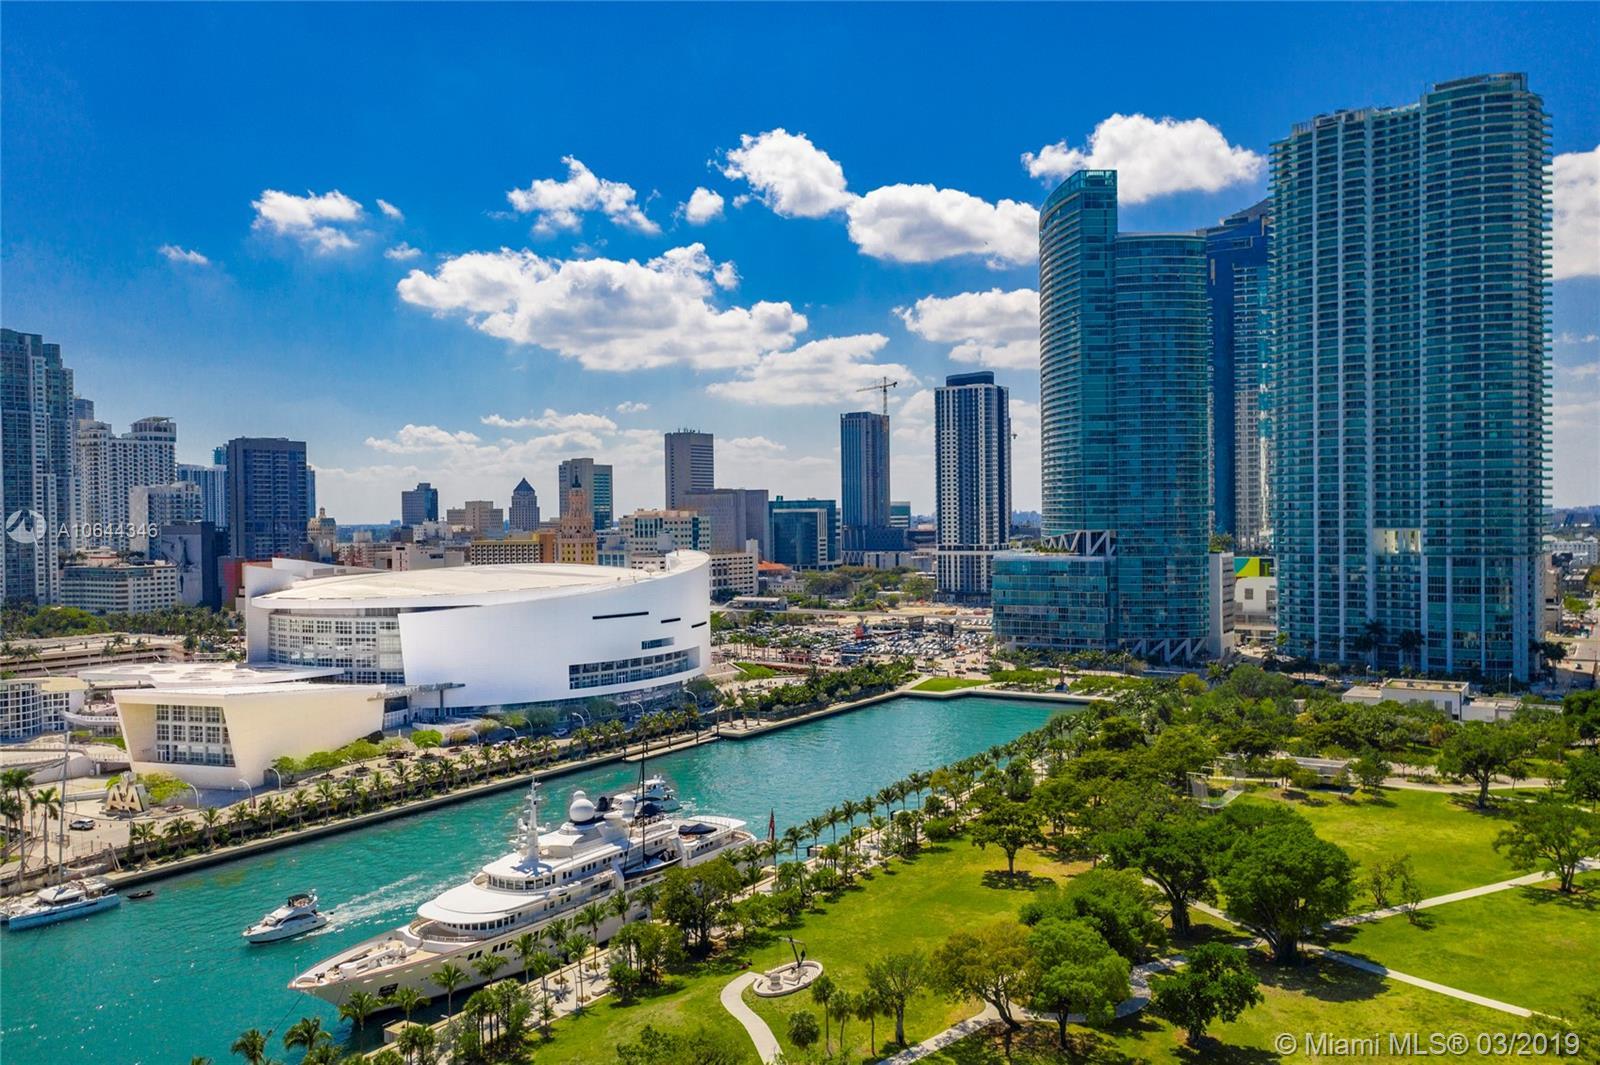 888 Biscayne Blvd, CU6 - Miami, Florida